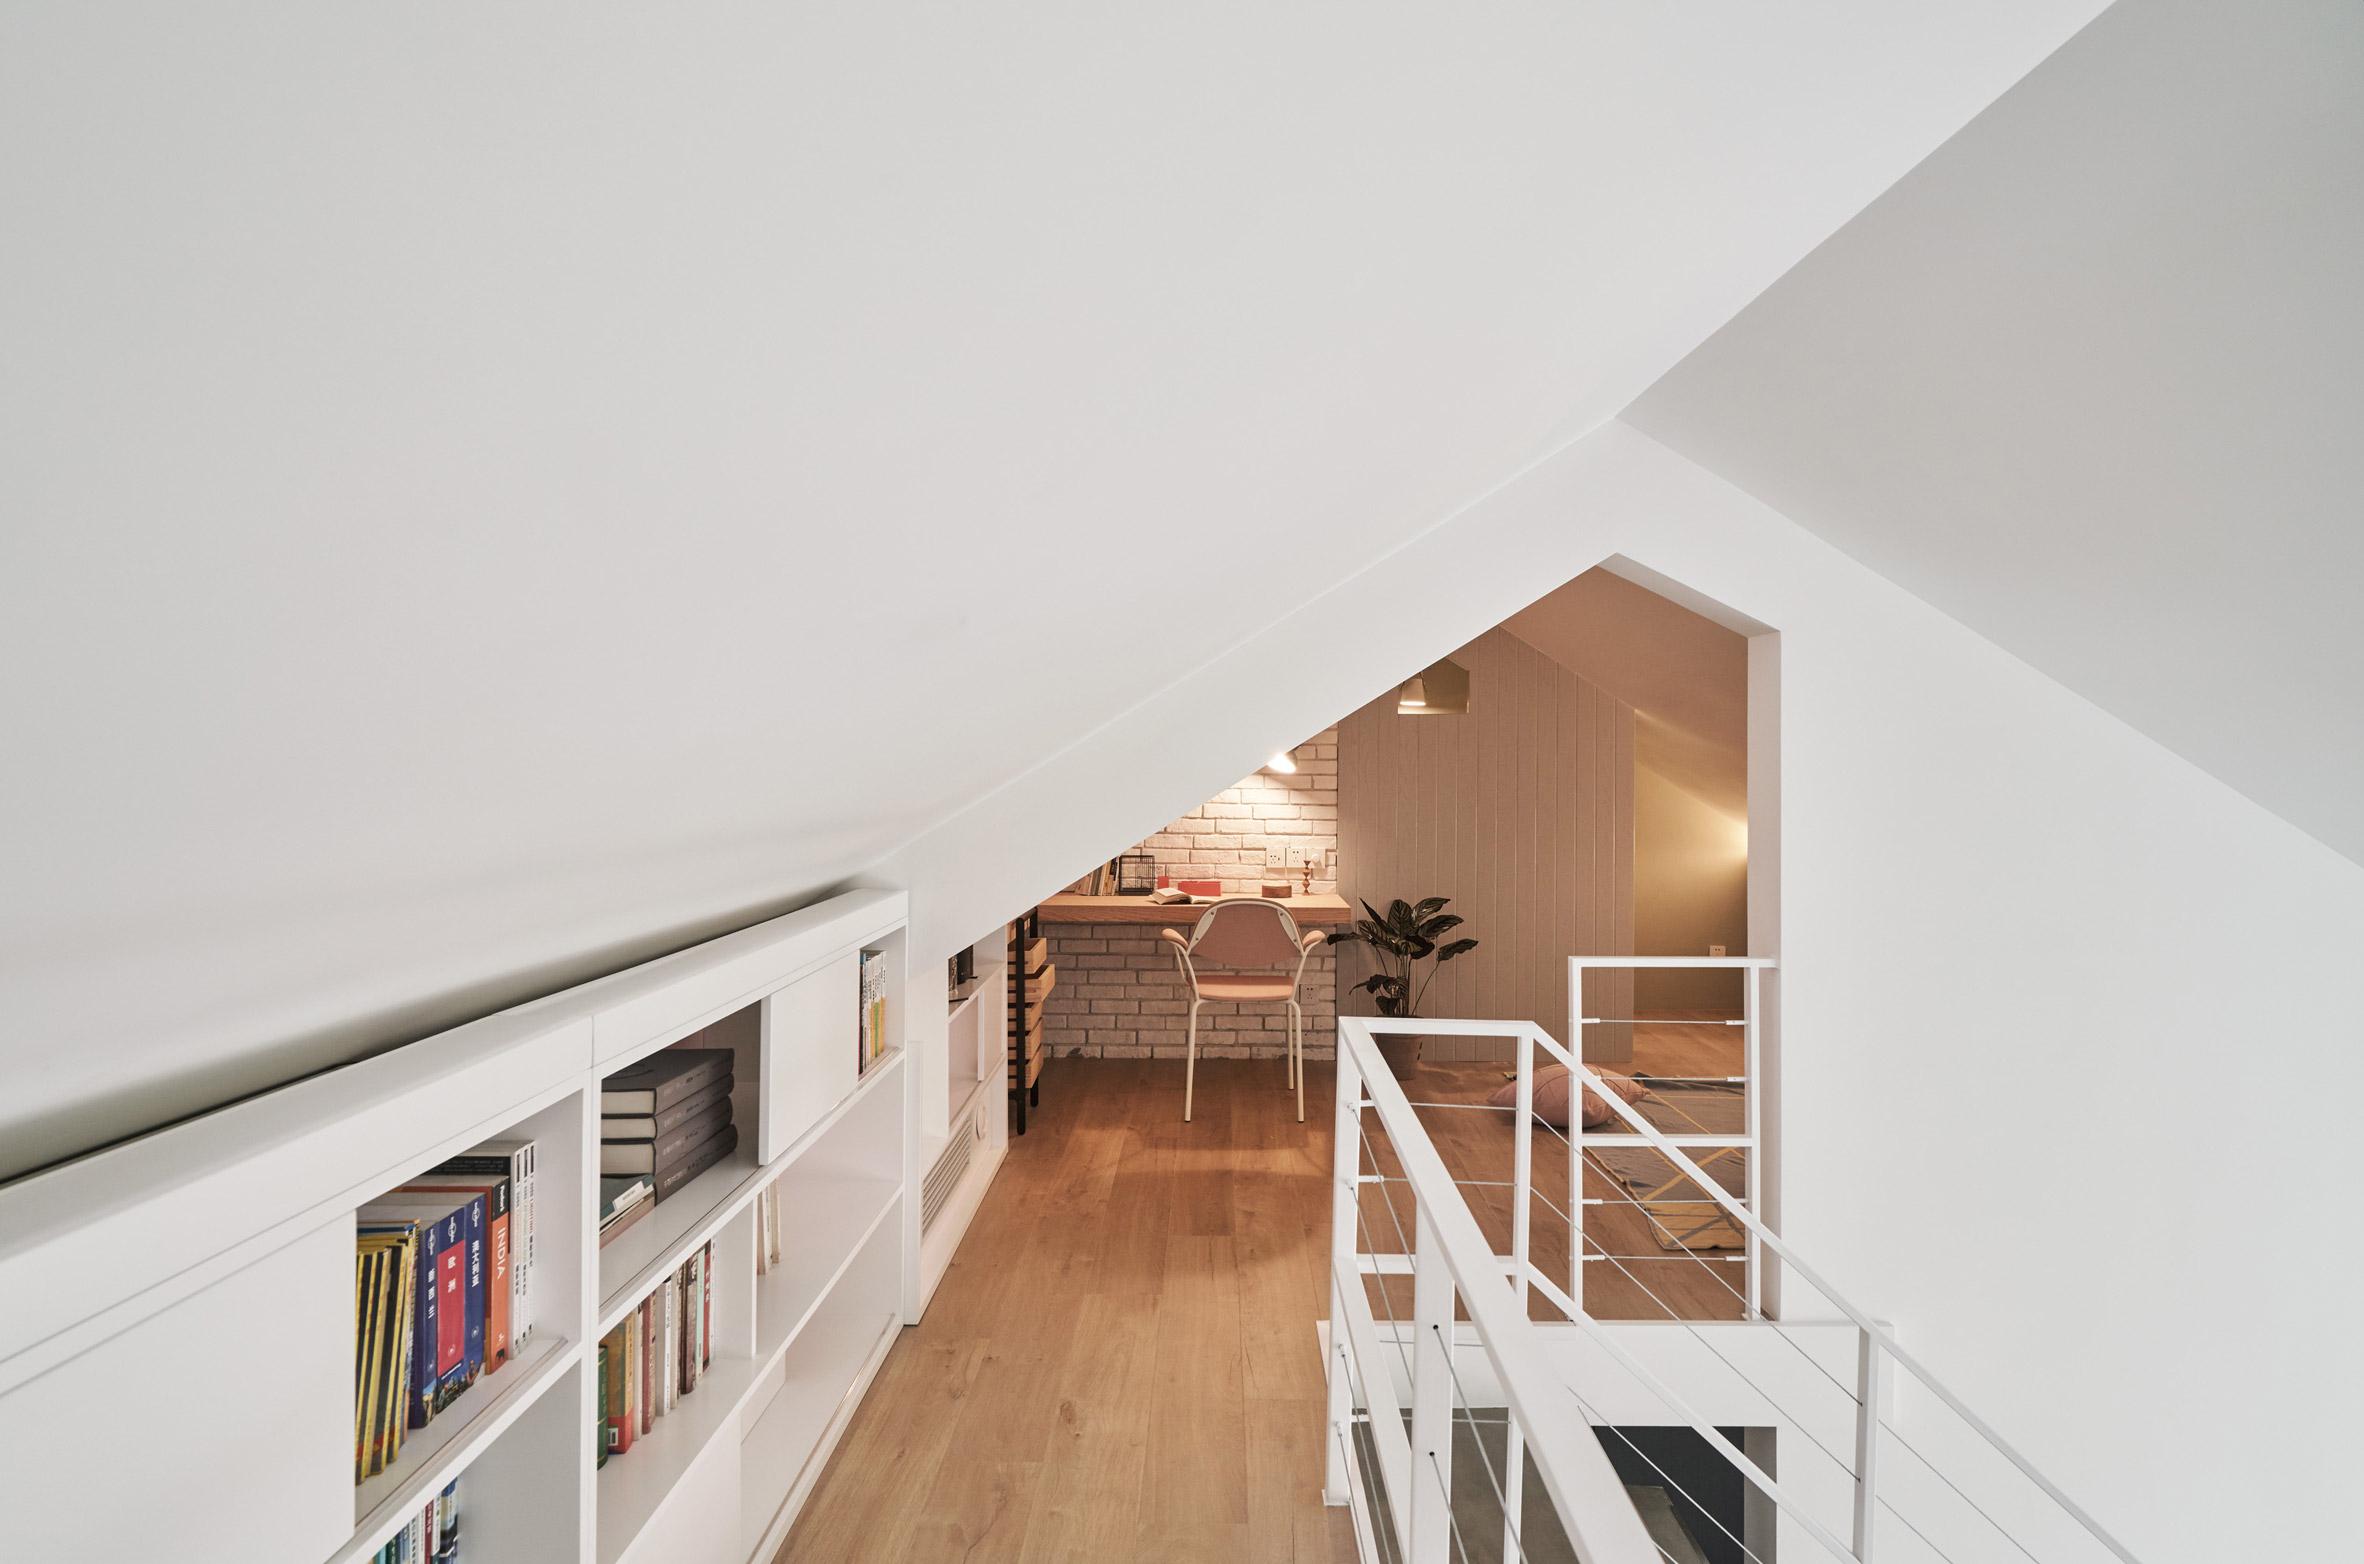 căn hộ cho gia đình trẻ starburst-house-hao-design-interiors-residential-china-beijing-elledecoration vietnam 5